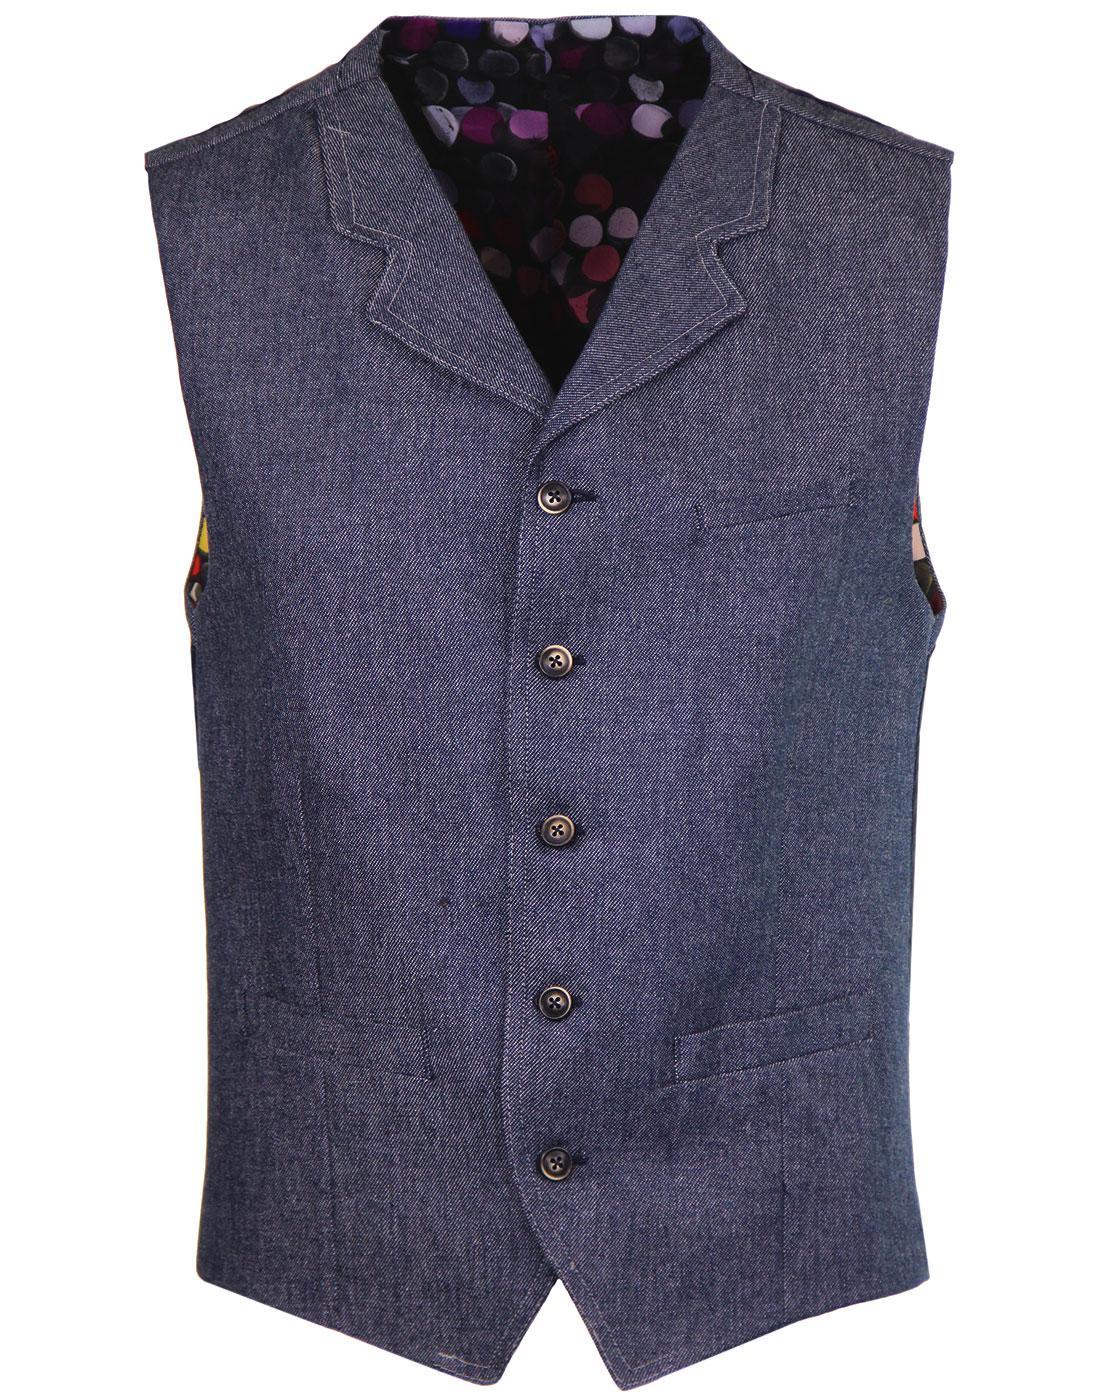 Tyburn GIBSON LONDON Mod Oxford Twill Waistcoat